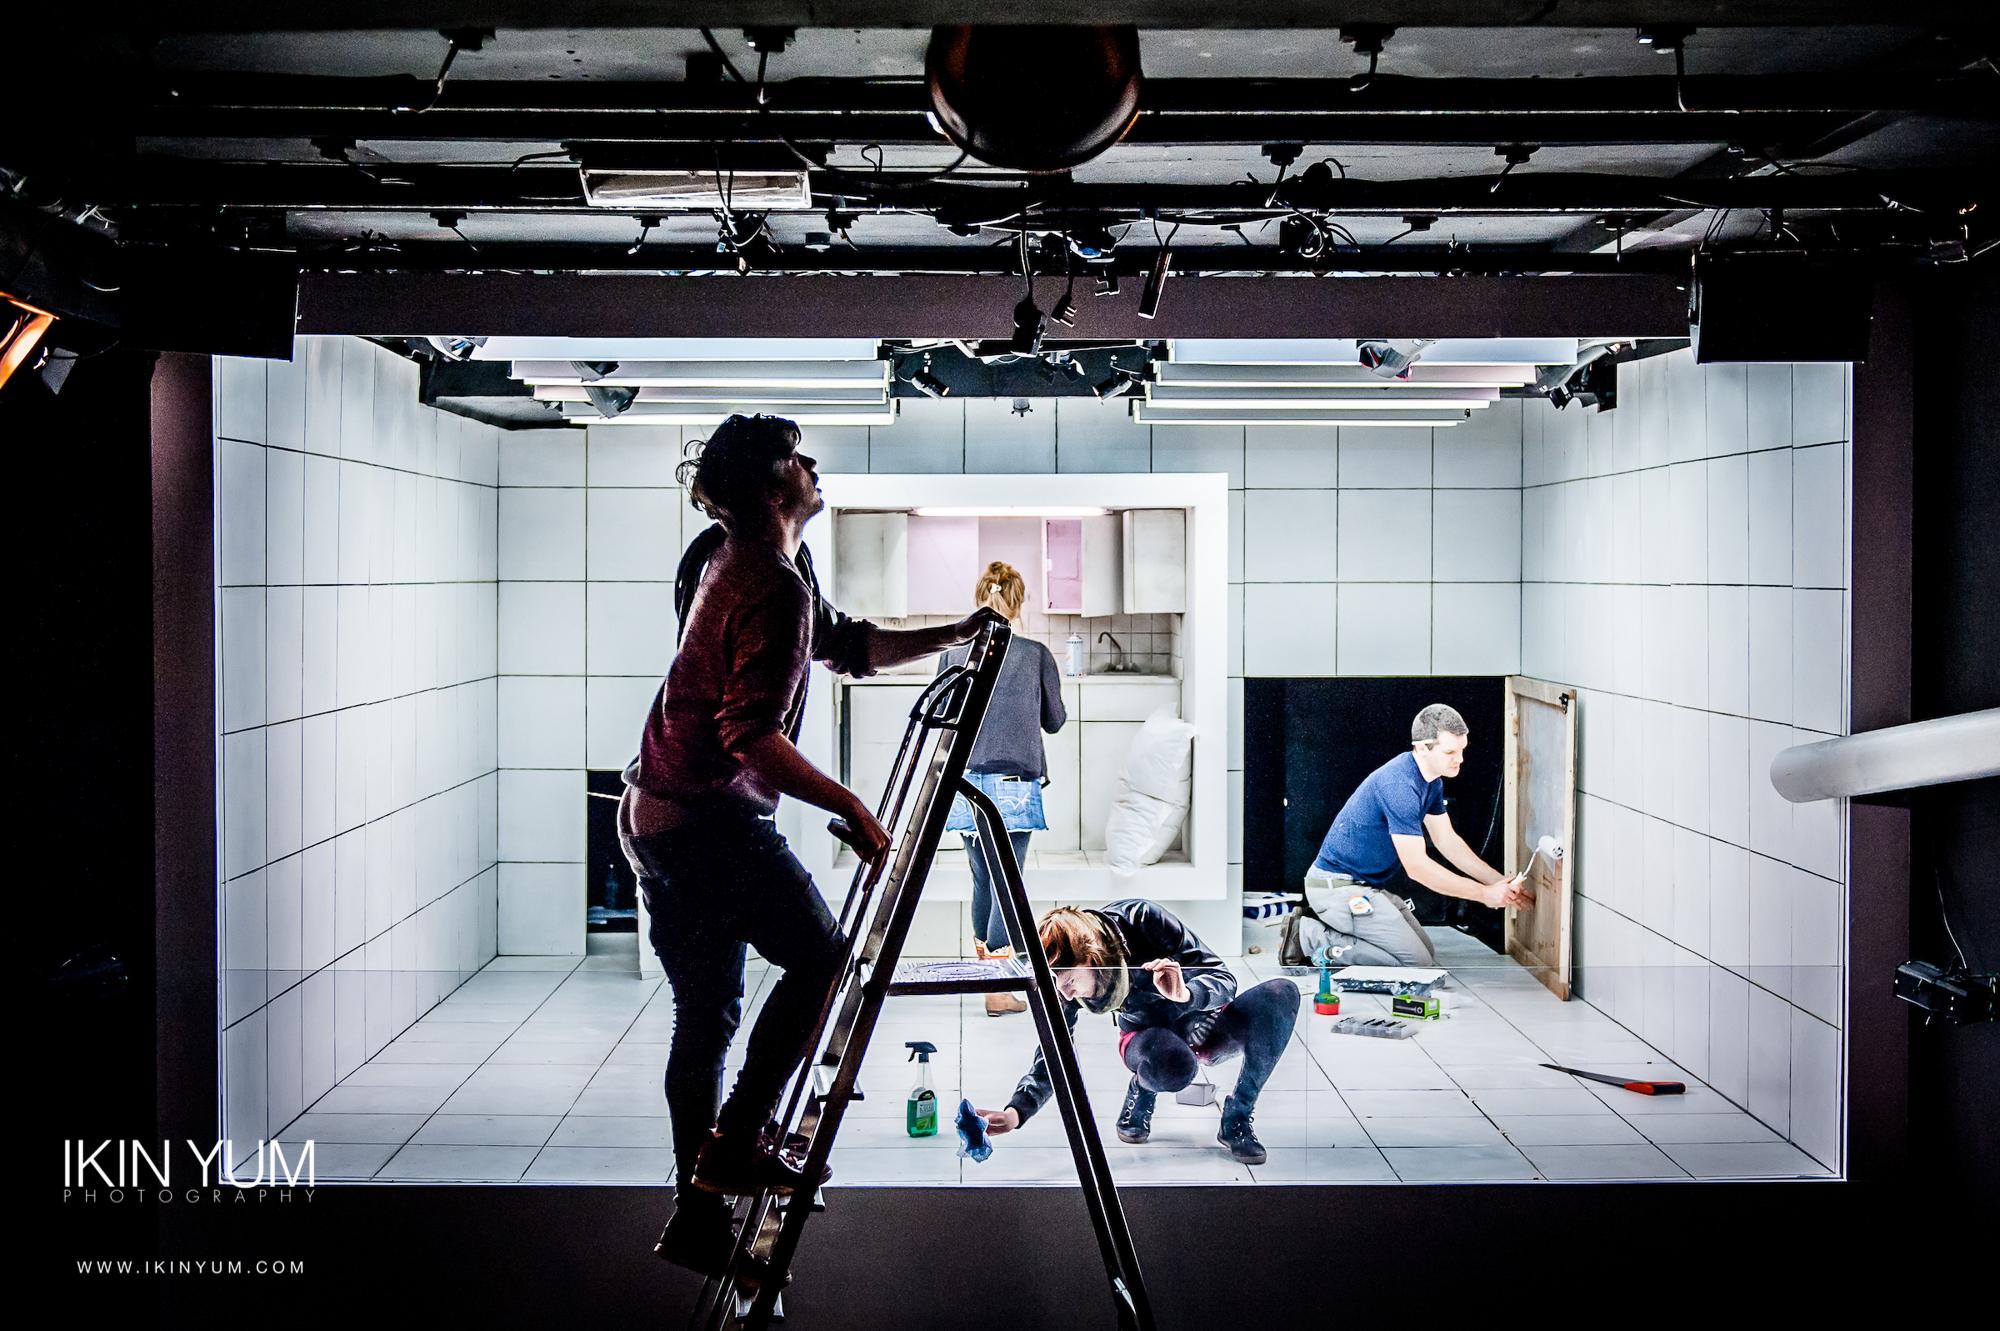 Goya - Gate theatre - Ikin Yum Photography-002.jpg